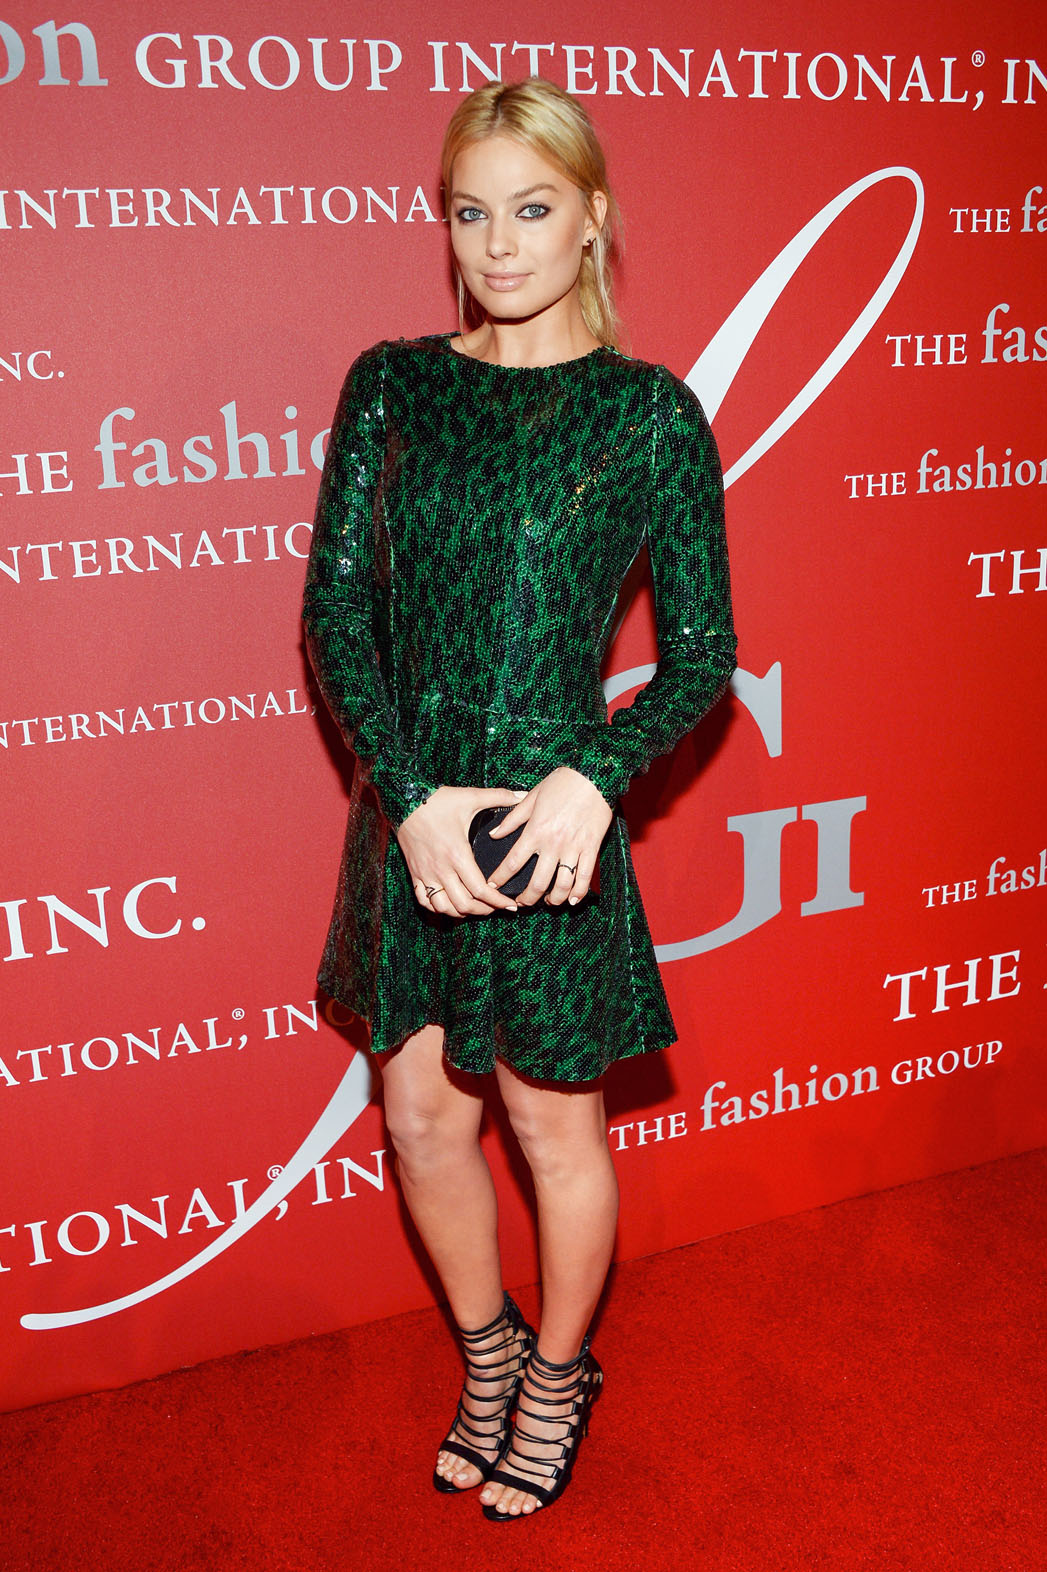 Margot Robbie Fashion Group International - P 2014